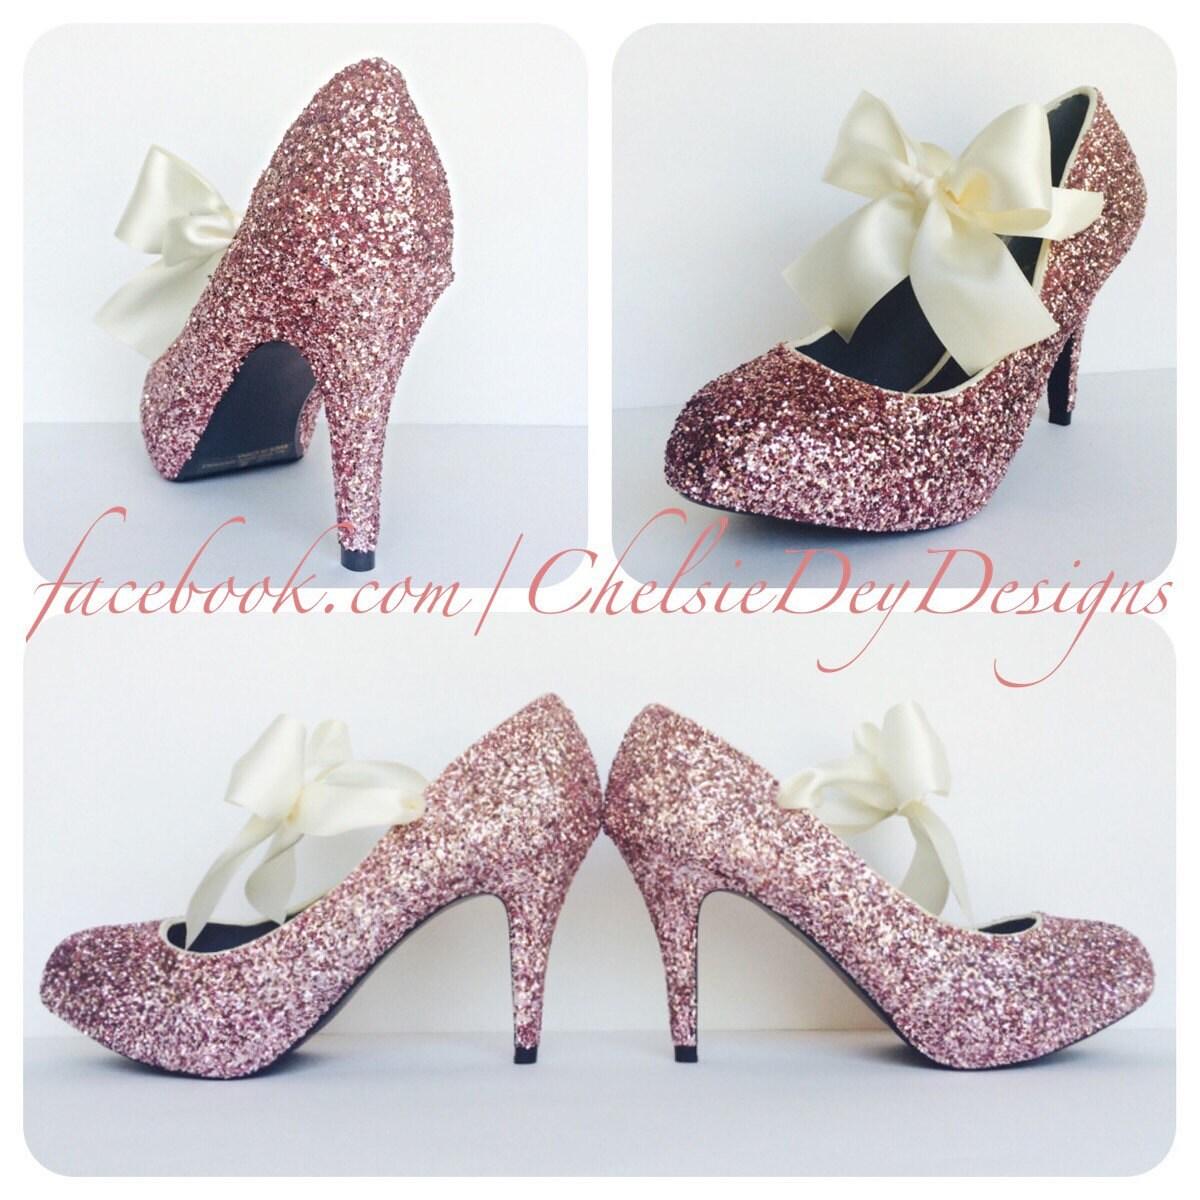 Pale Blush Light Pink Rose Glitter Pump Pump High Heels with